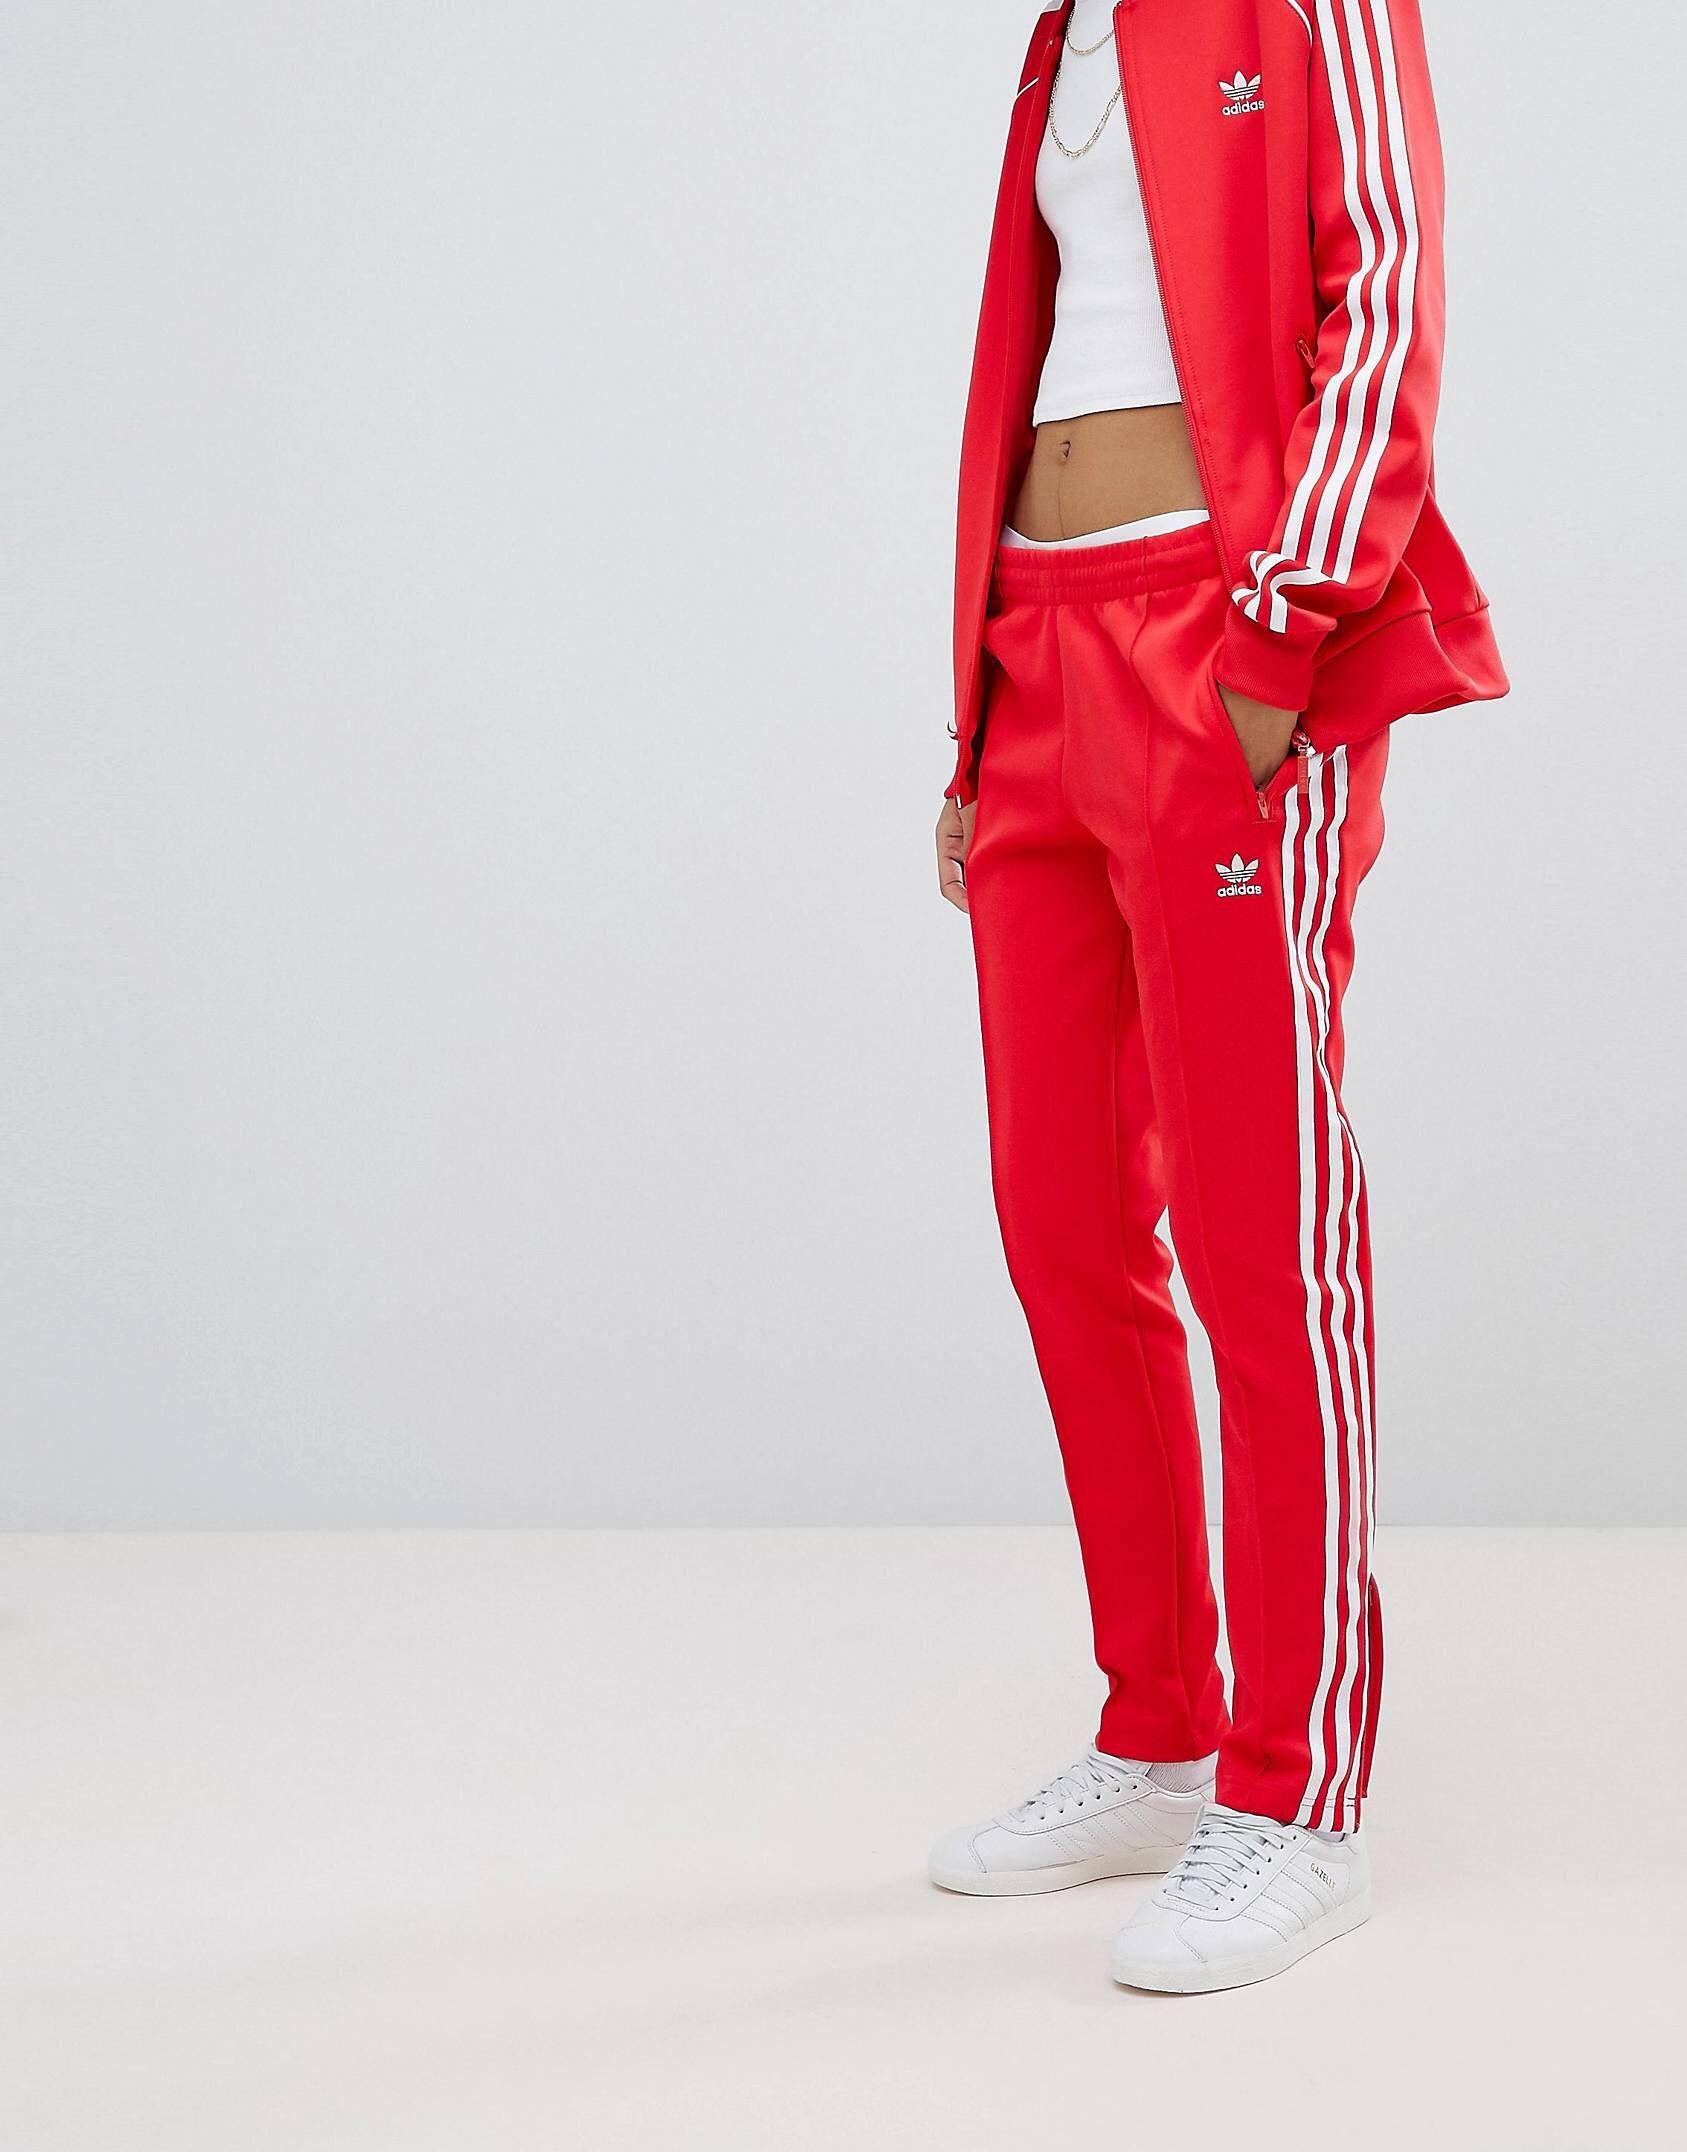 Pin de Roxi Gonzales en ropa | Pantalones de chándal, Ropa ...